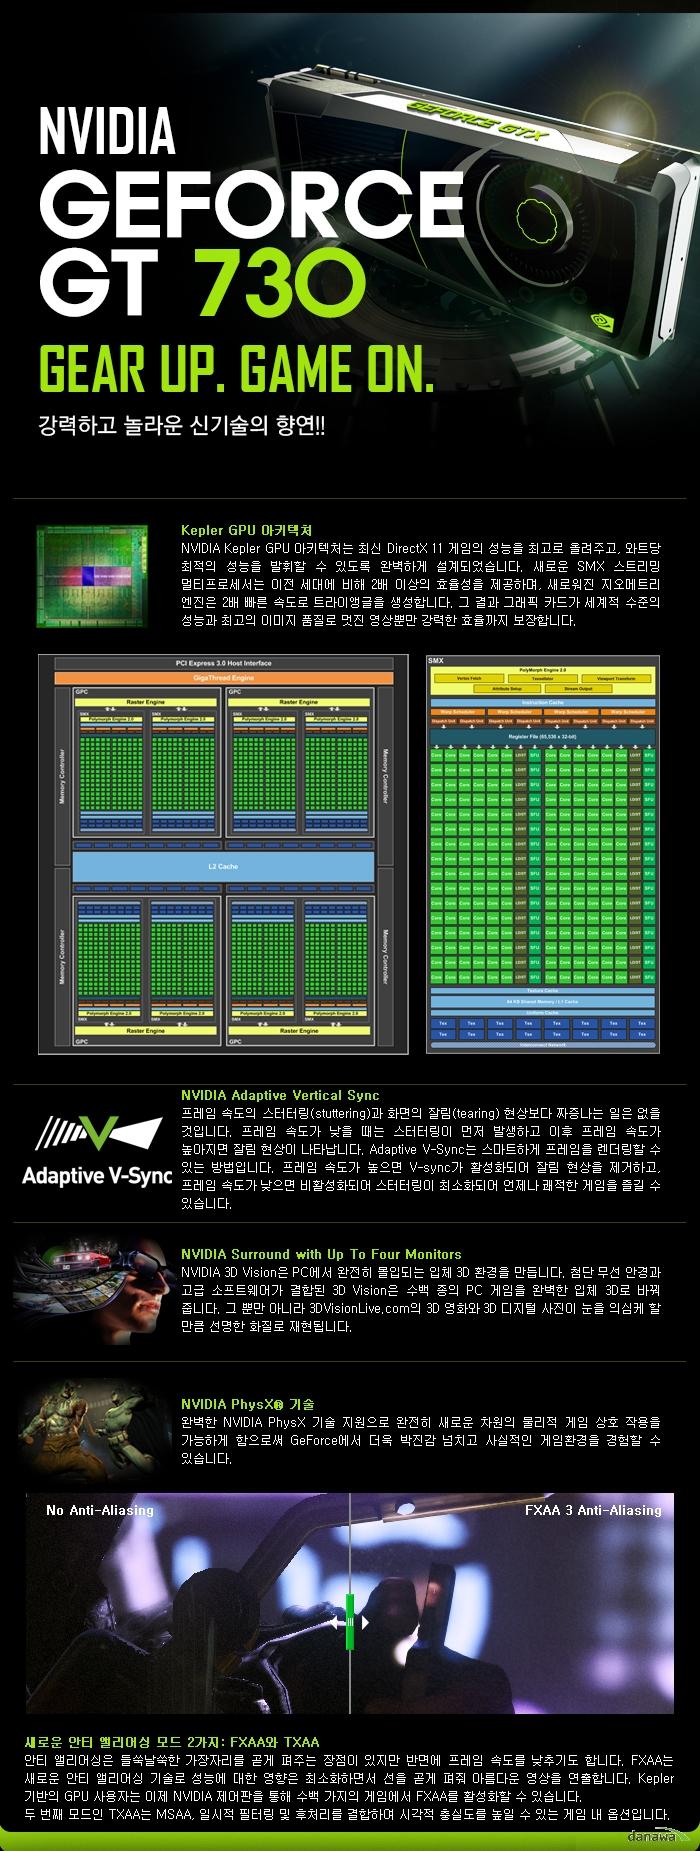 XENON GT730 D3 1GB LP의 제품 기술설명